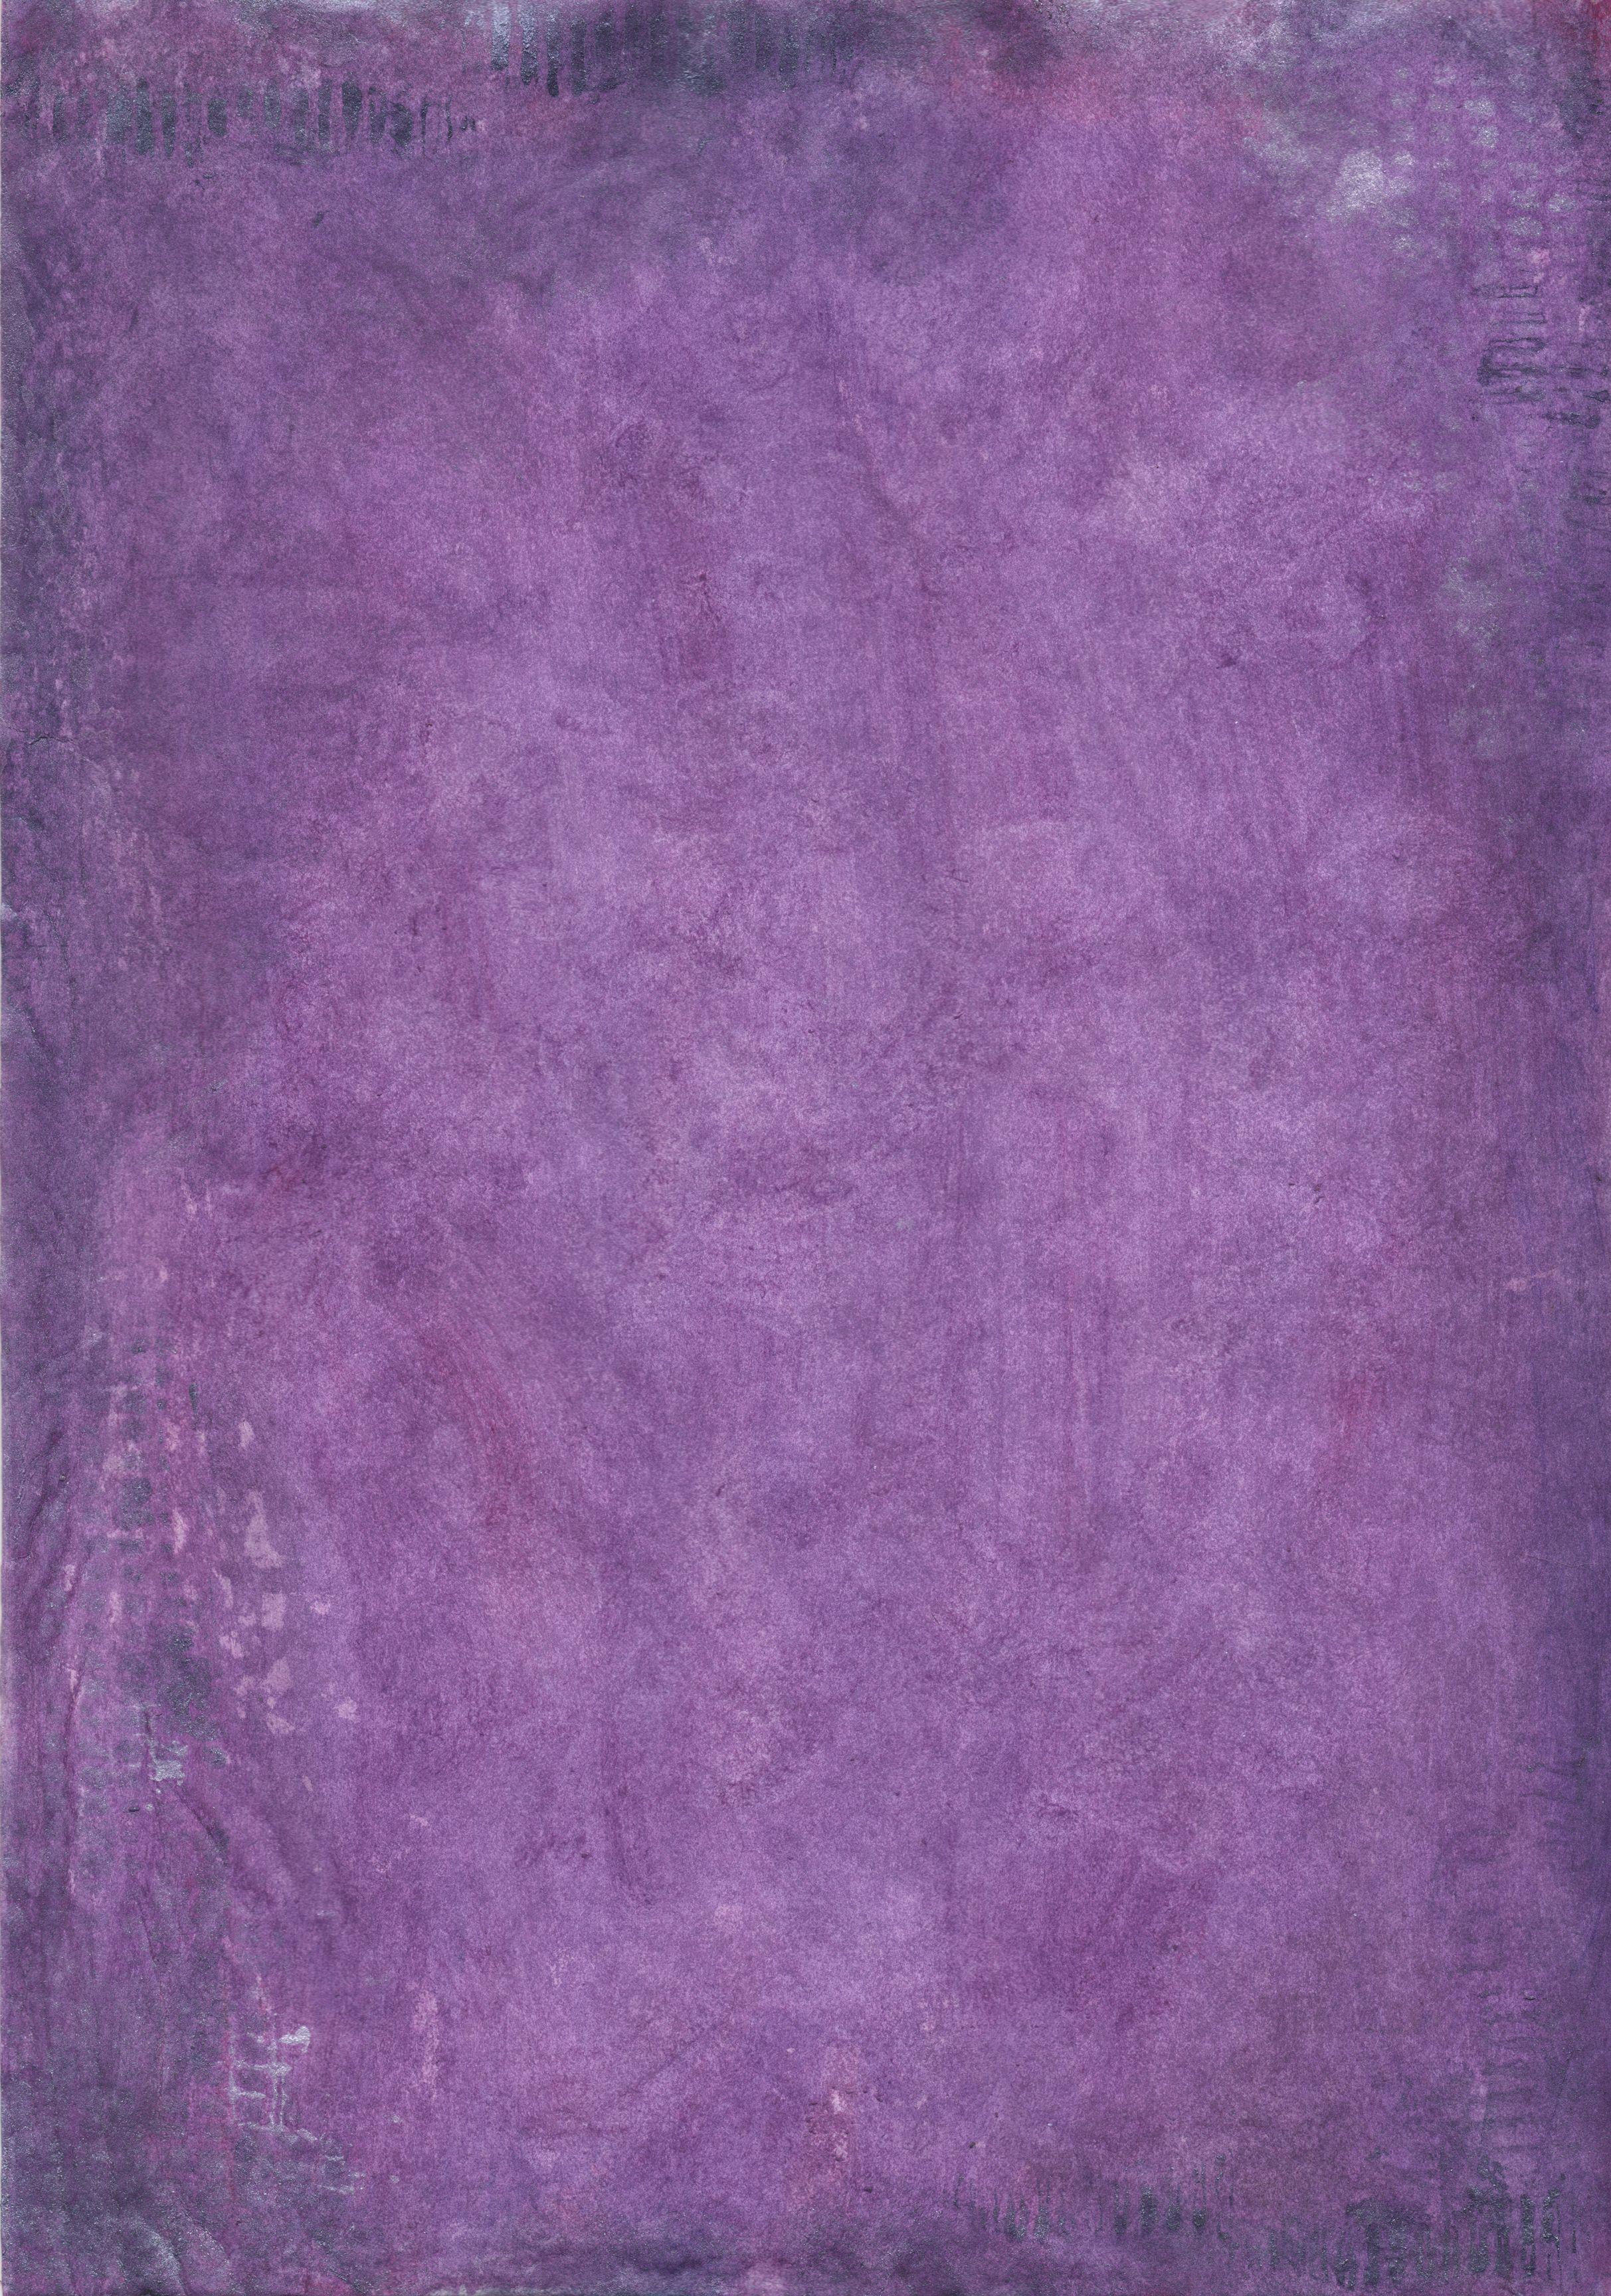 Images For Gt Light Purple Textures Apt Goals Light